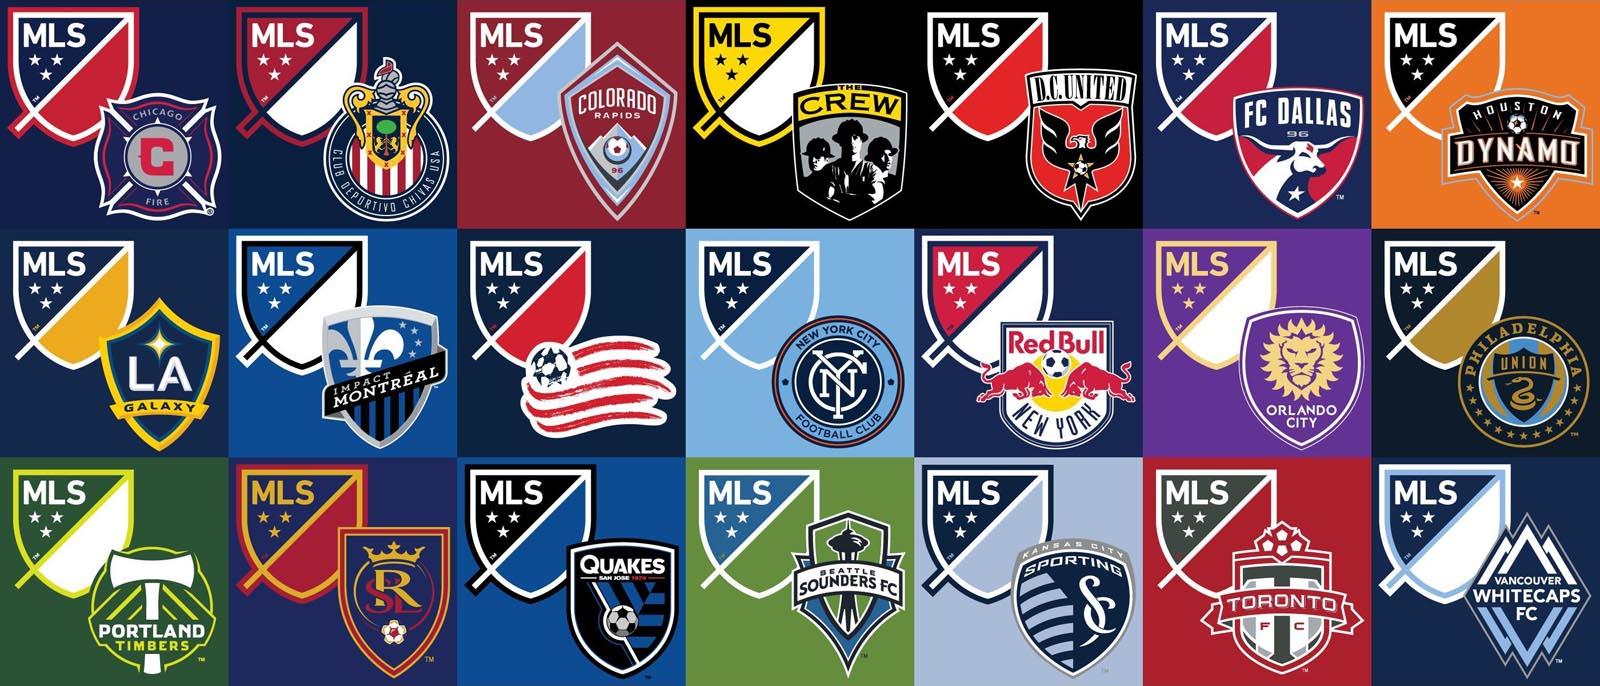 BODY ONLY GFX MLS TEAMS 2016 - Goal.com